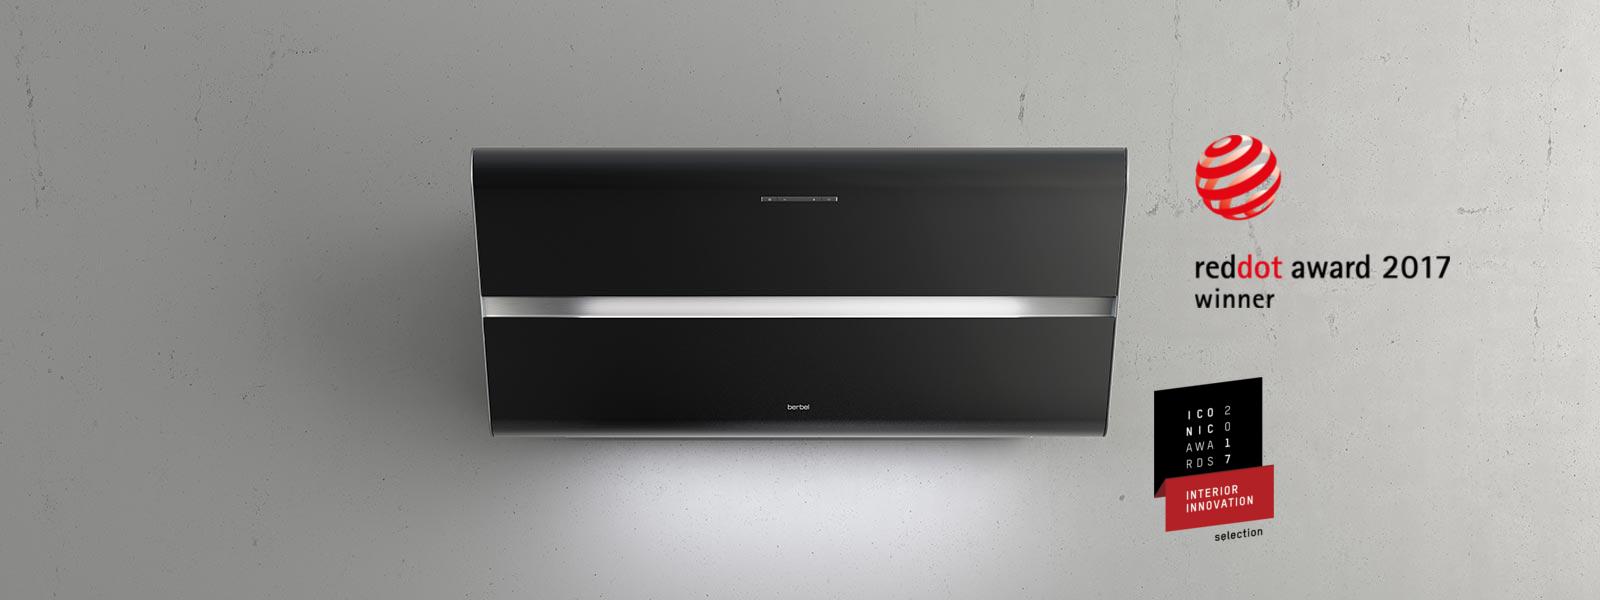 kopffreihaube smartline berbel ablufttechnik gmbh. Black Bedroom Furniture Sets. Home Design Ideas